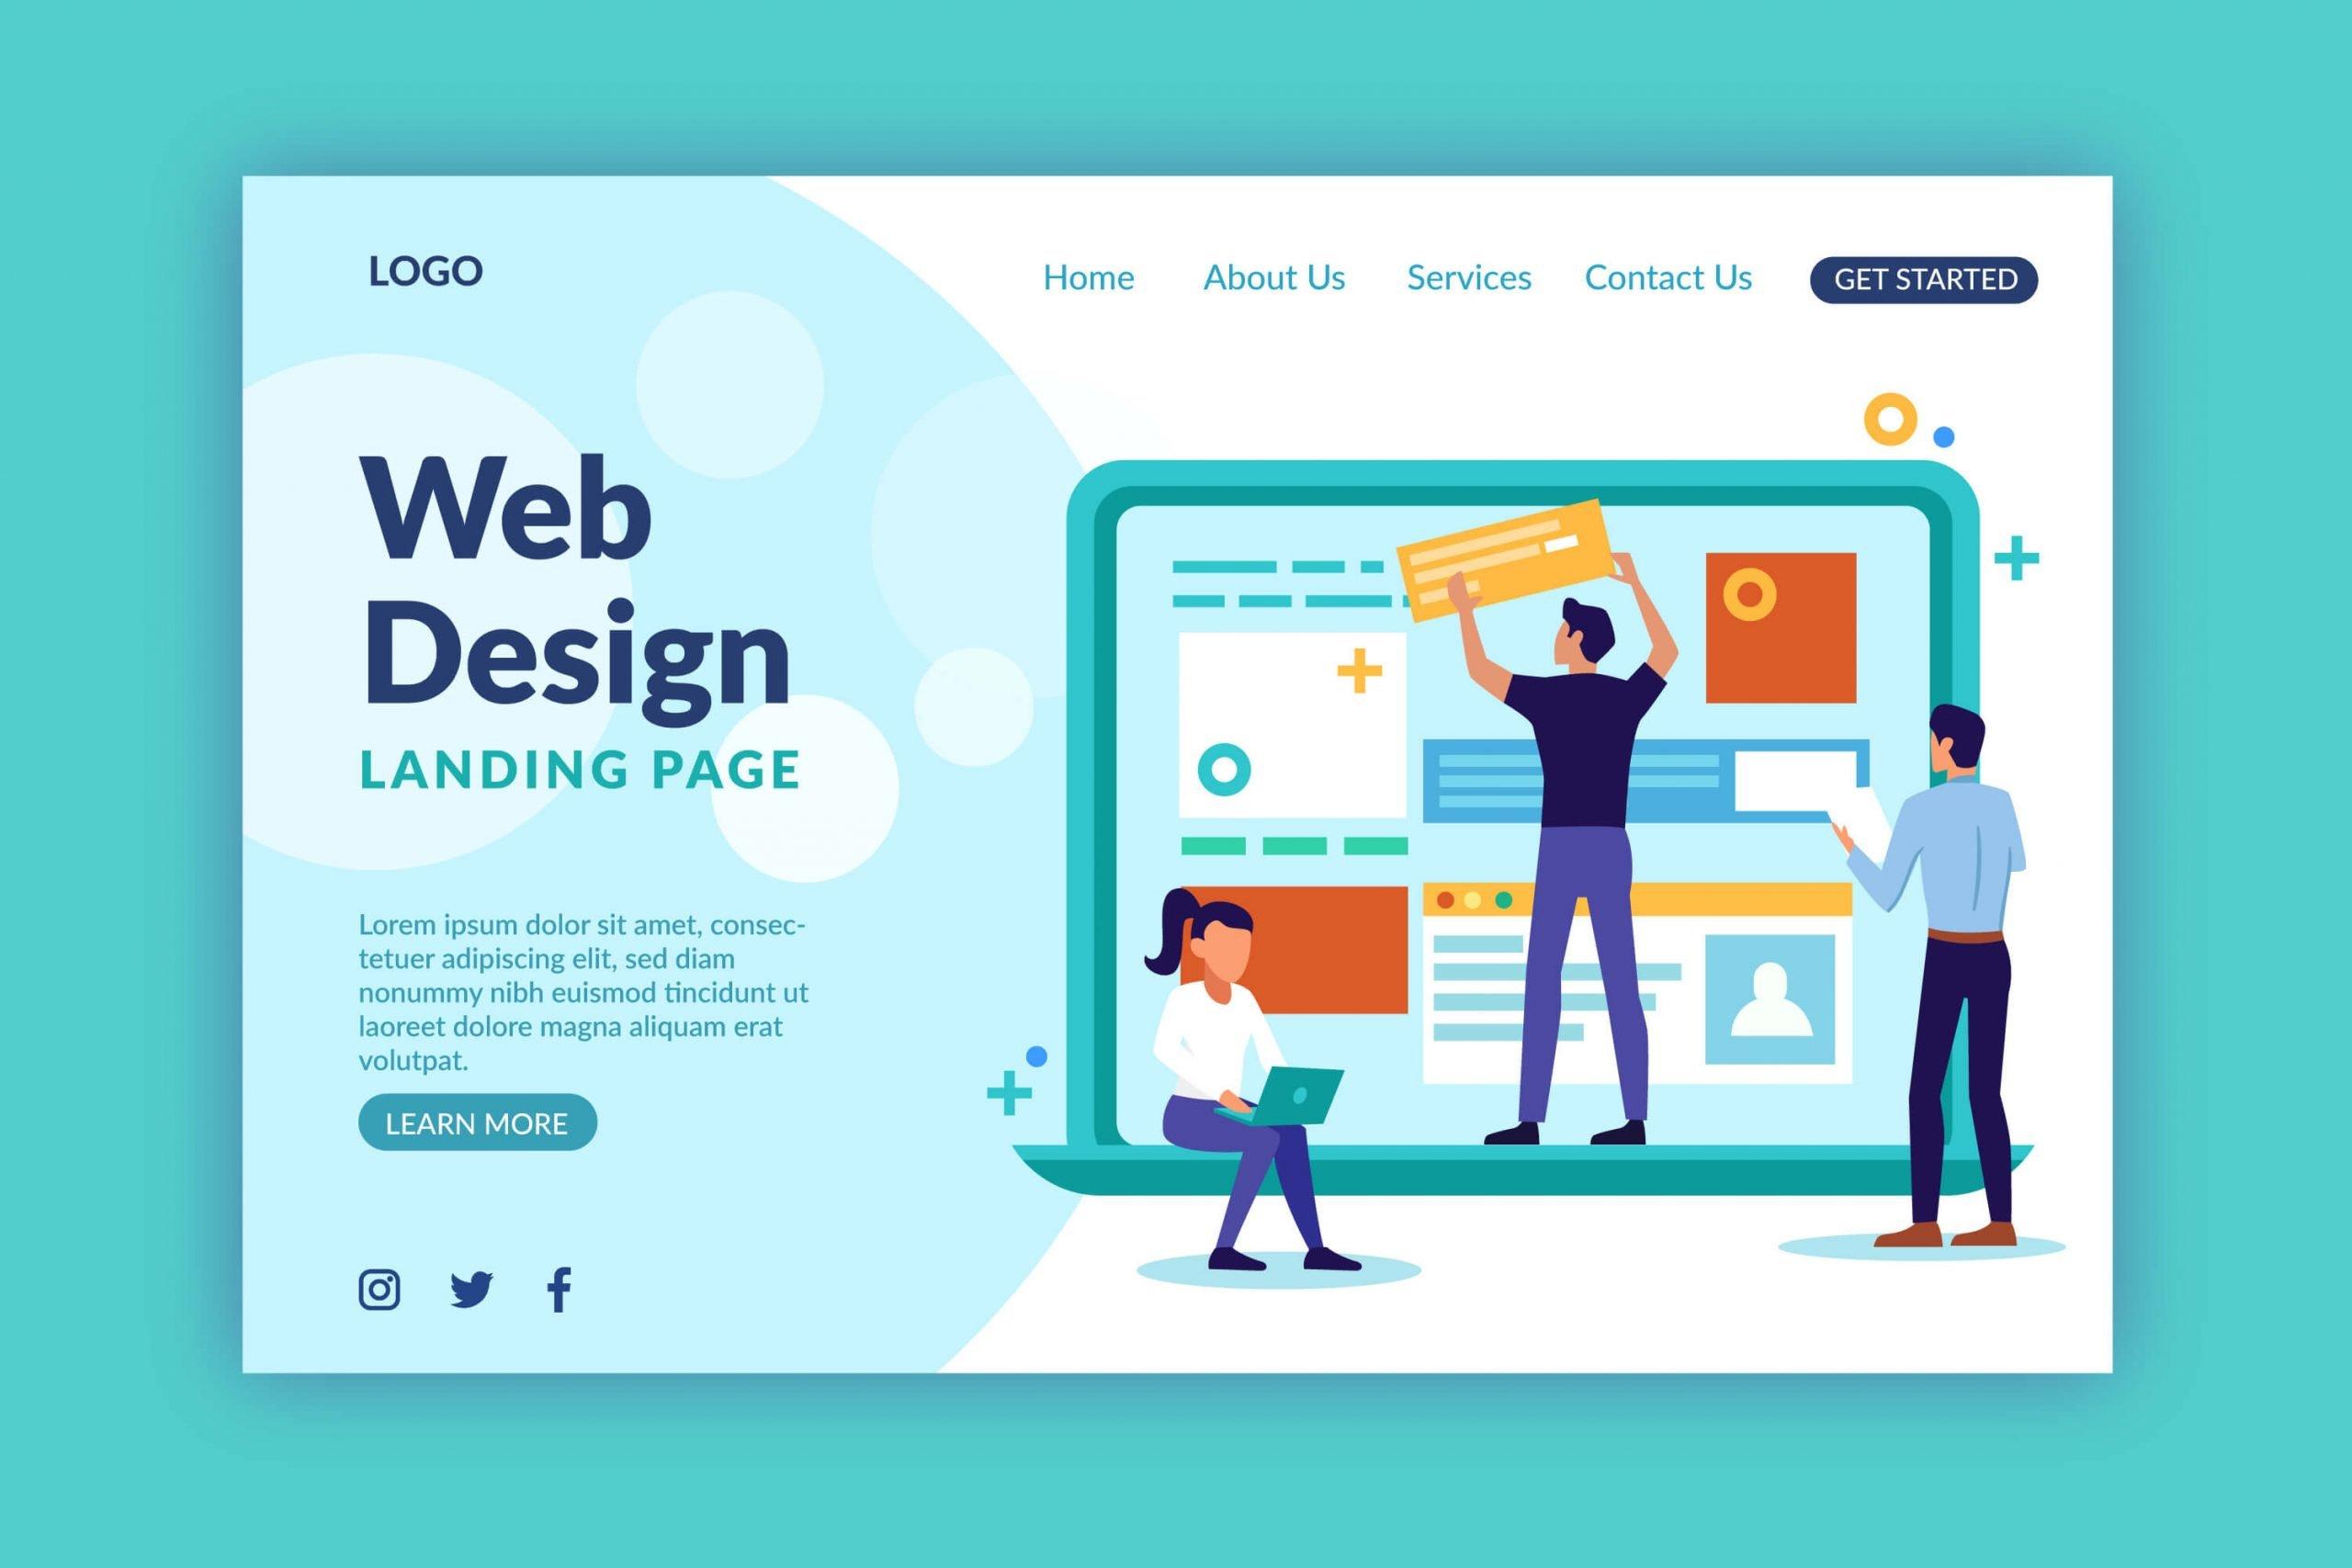 Best Web Design Practices